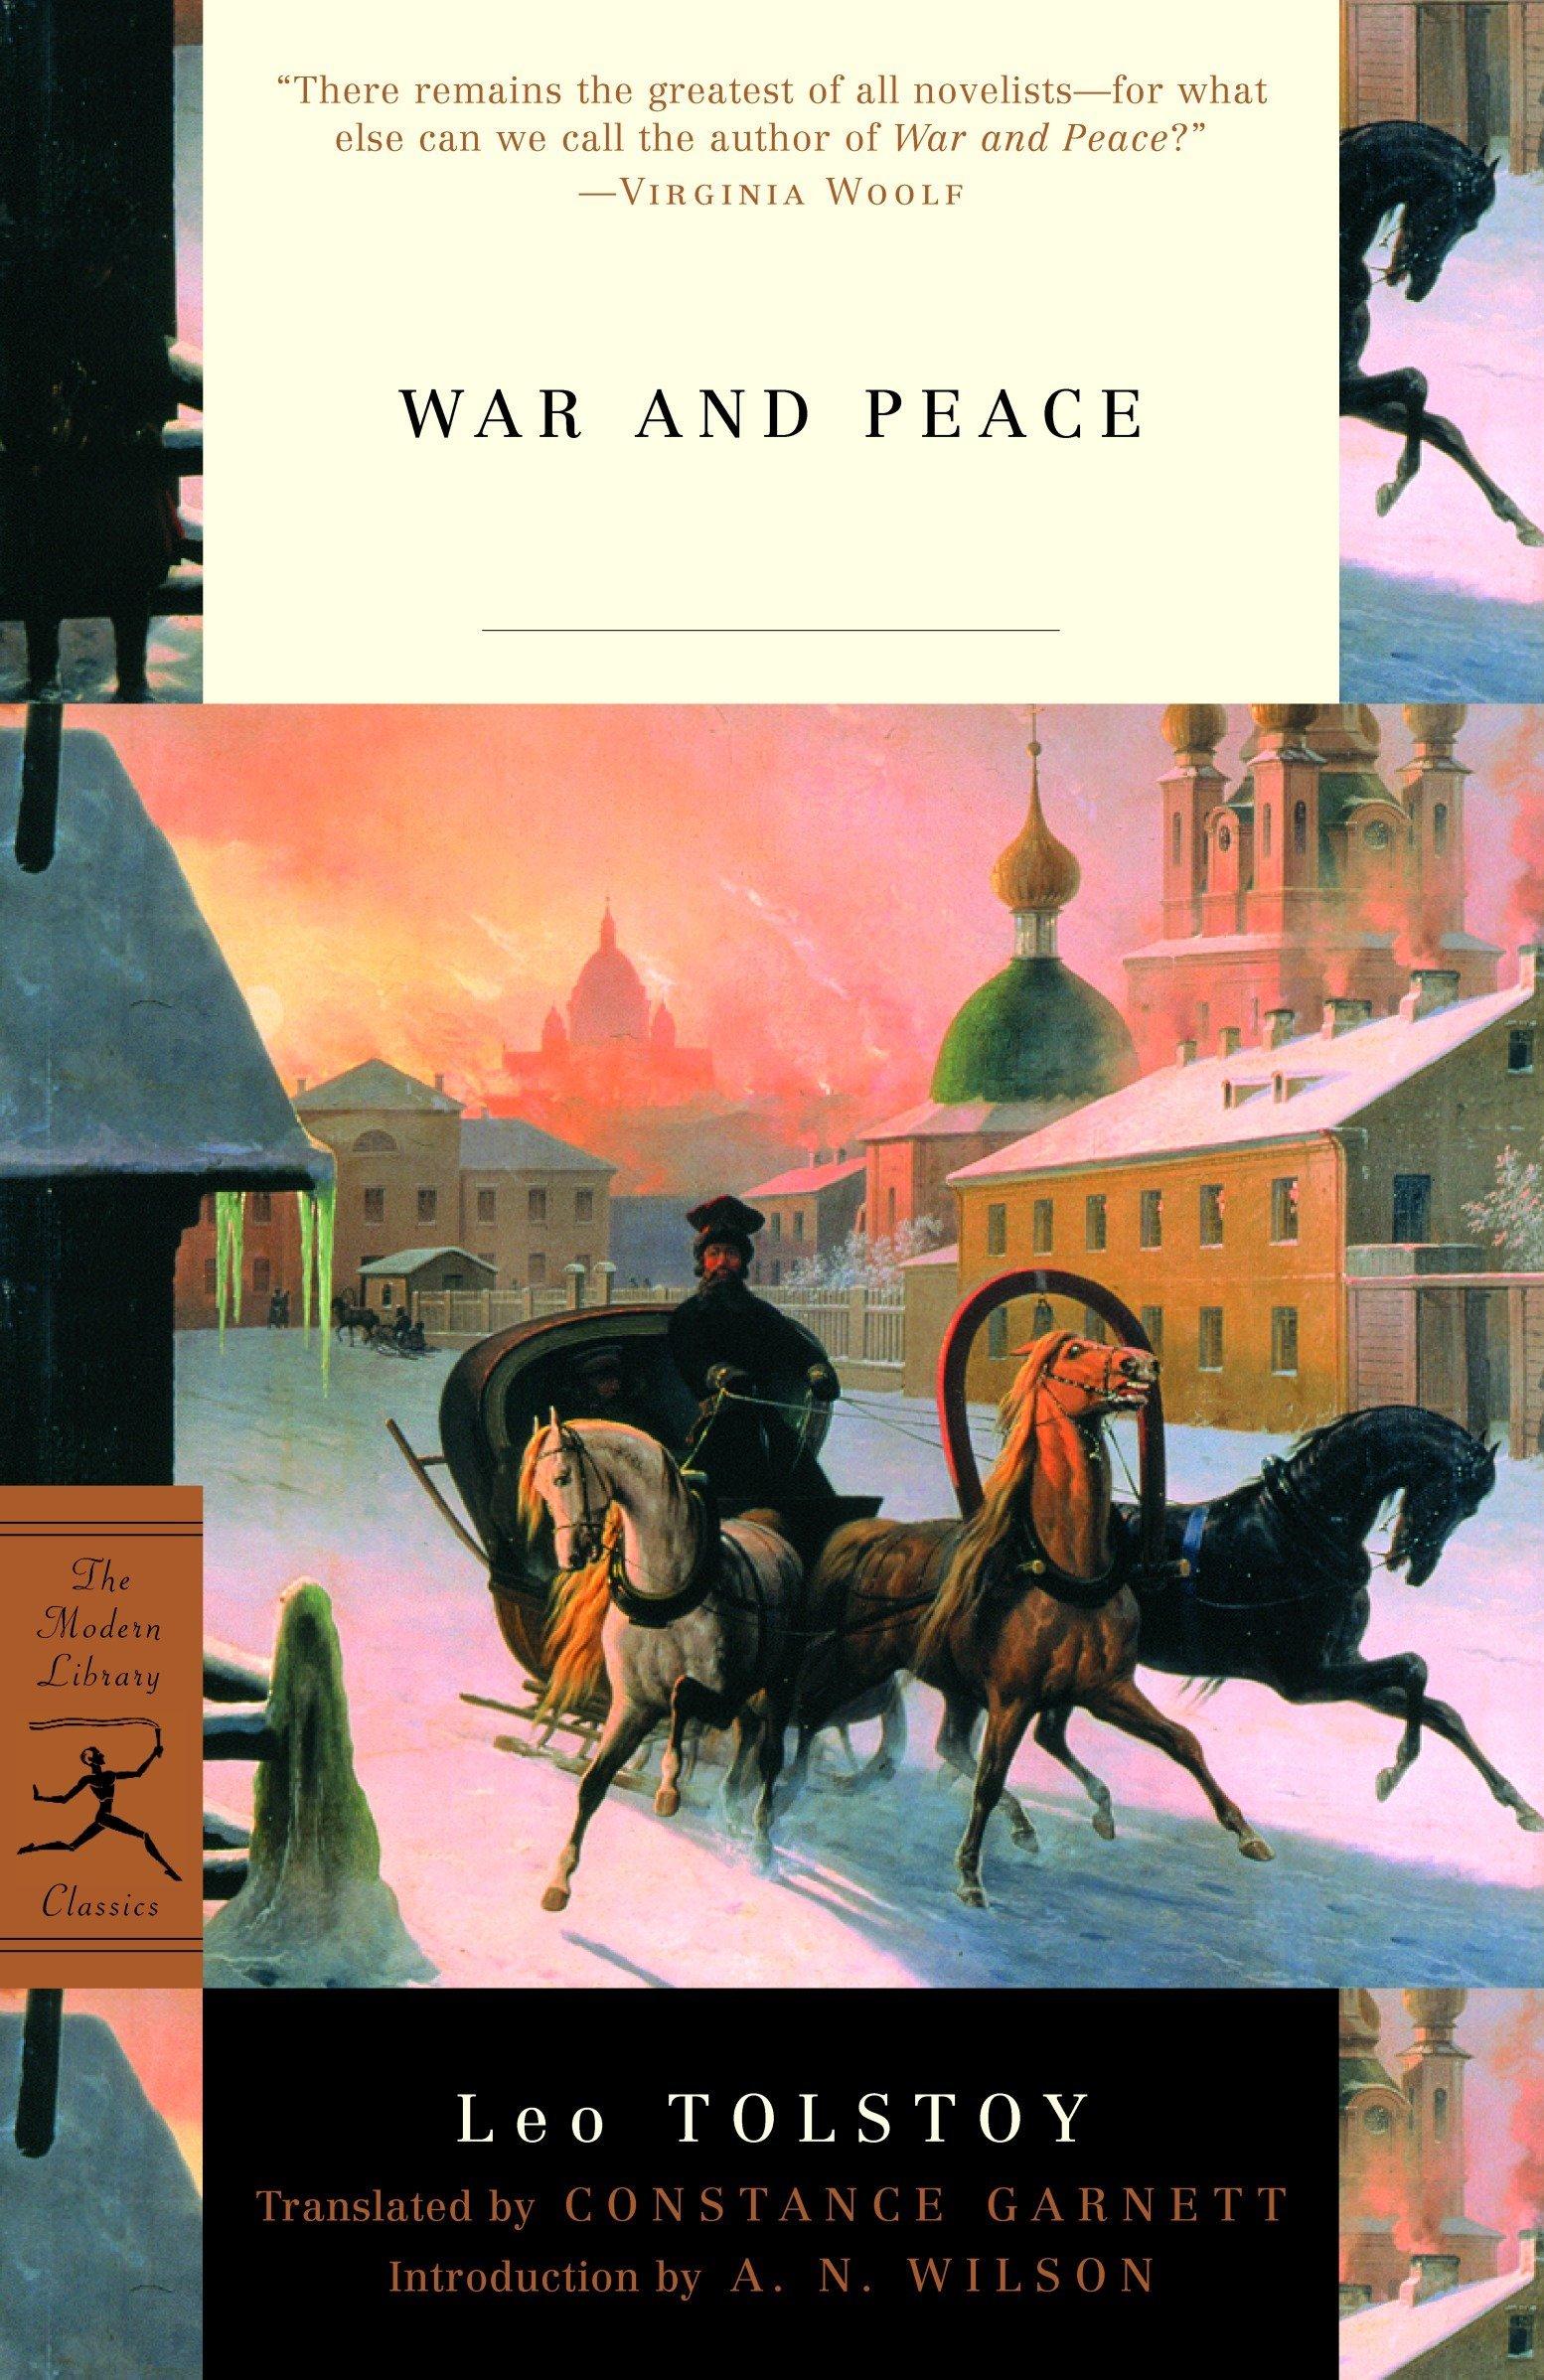 Kutuzov and Napoleon: comparative characteristics (based on Leo Tolstoys novel War and Peace)